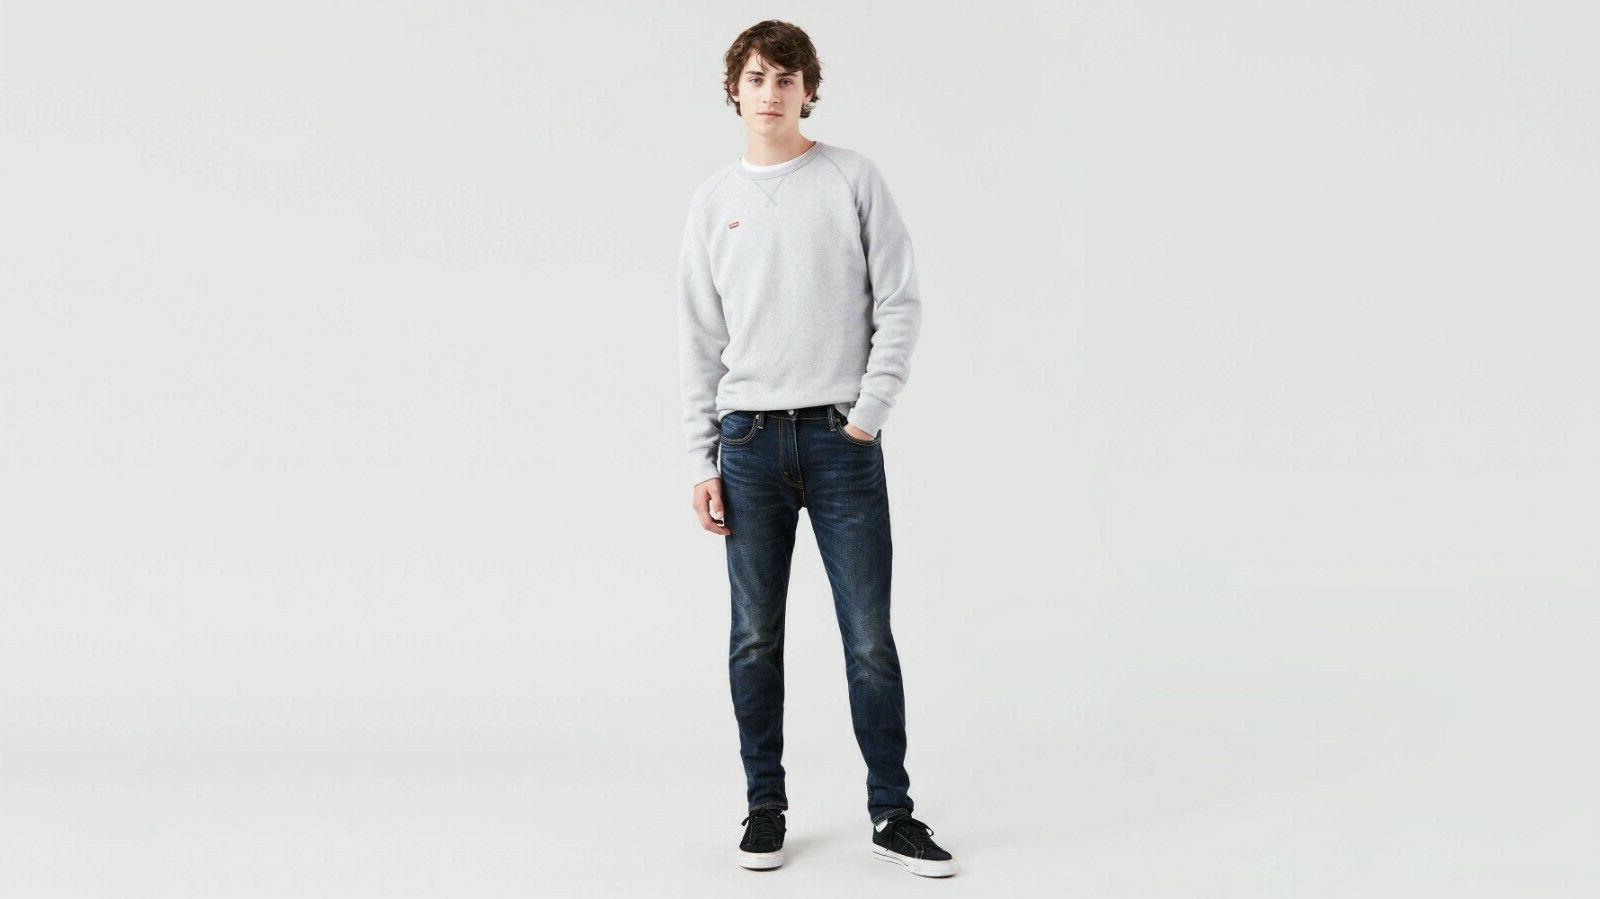 NWT Slim Fit Leg Jeans Stretch Denim Dark Blue